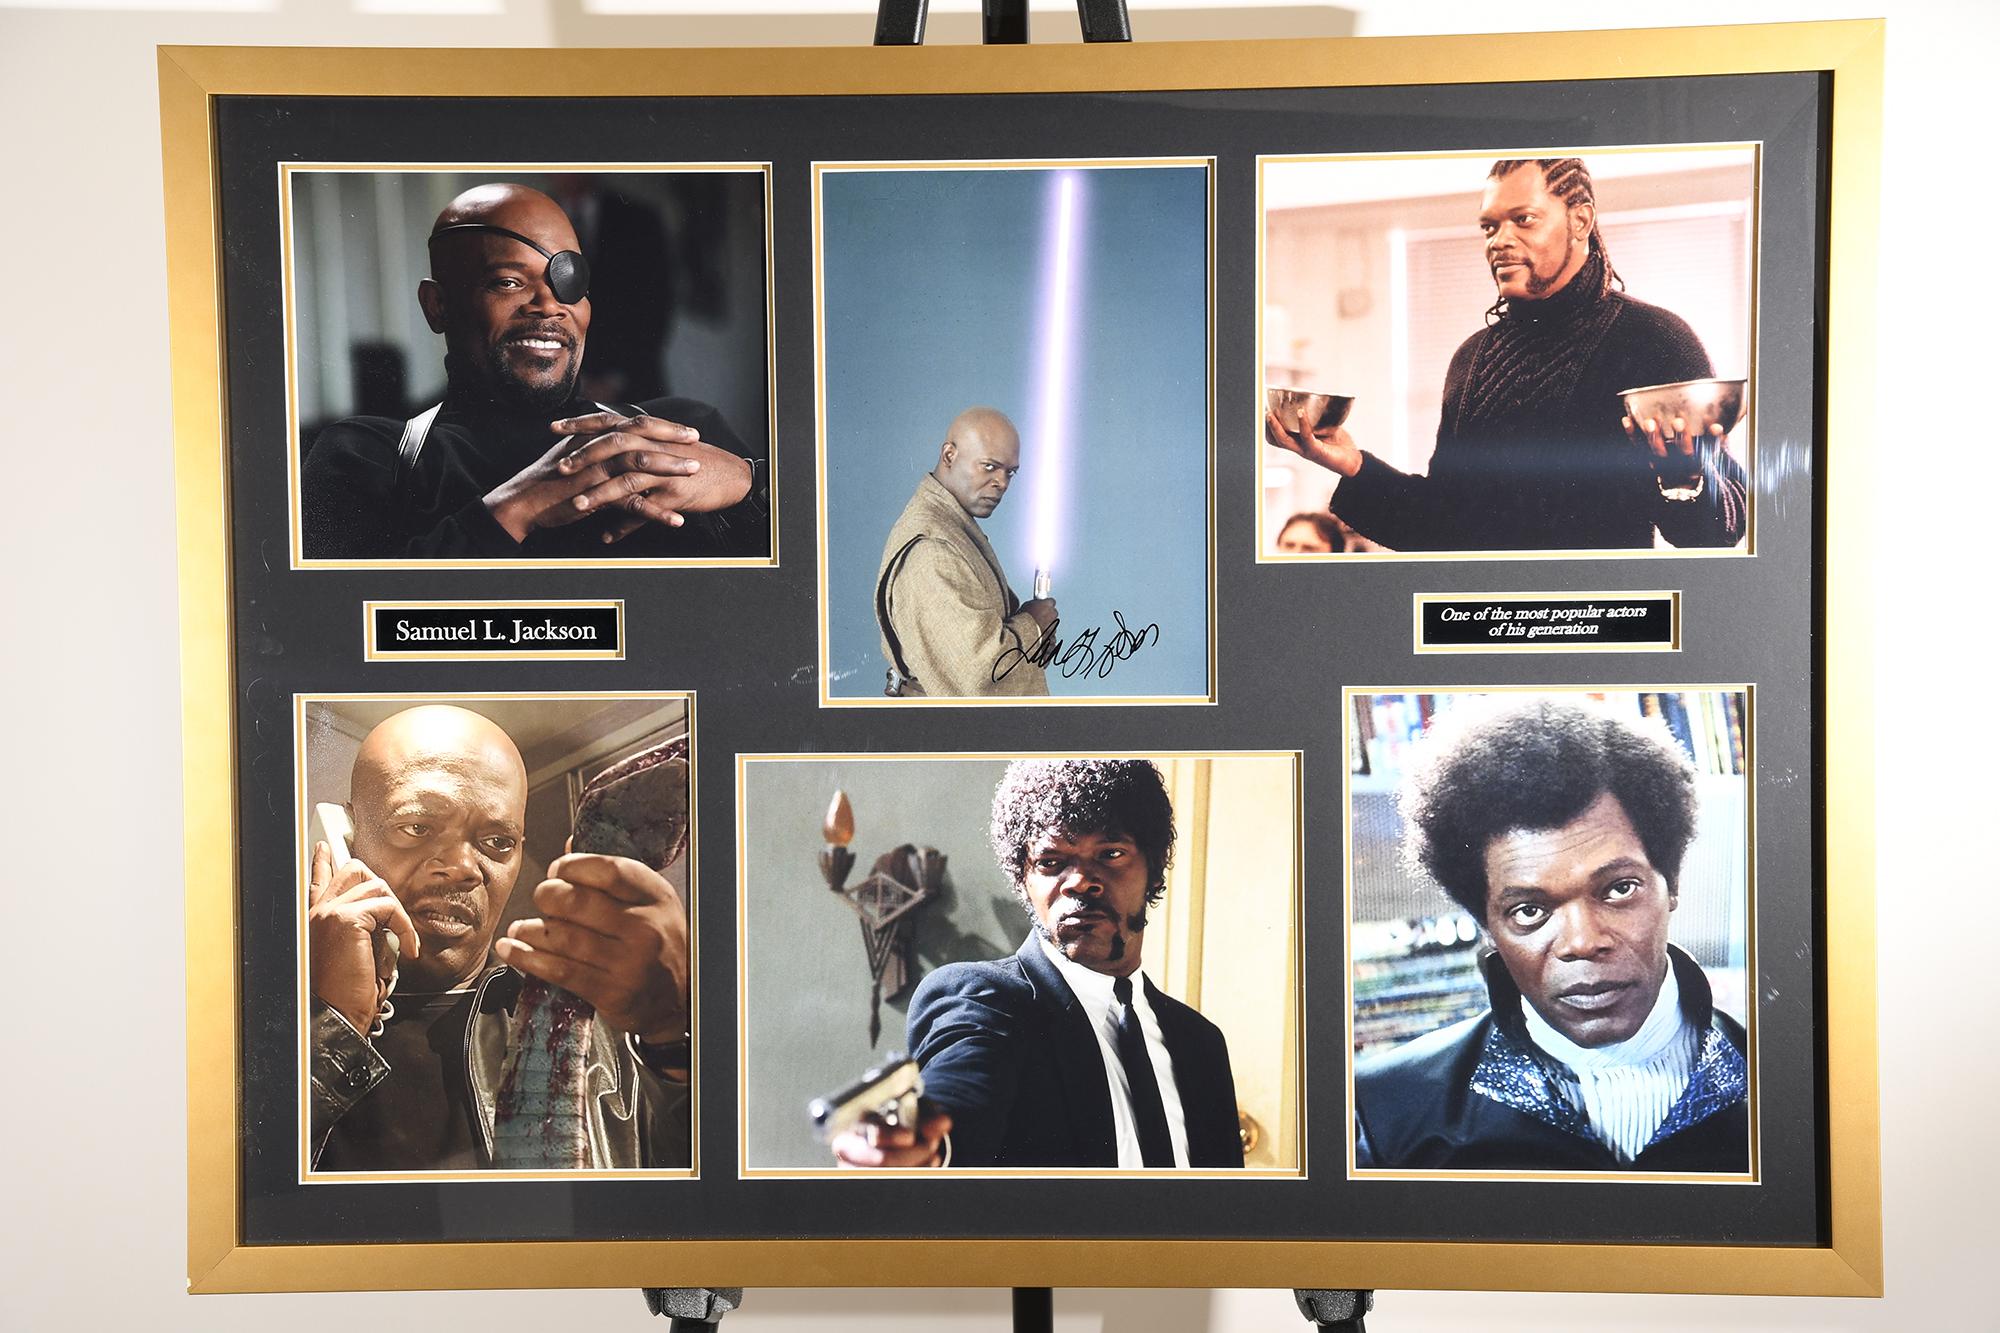 Samuel L Jackson Framed Signature Presentation